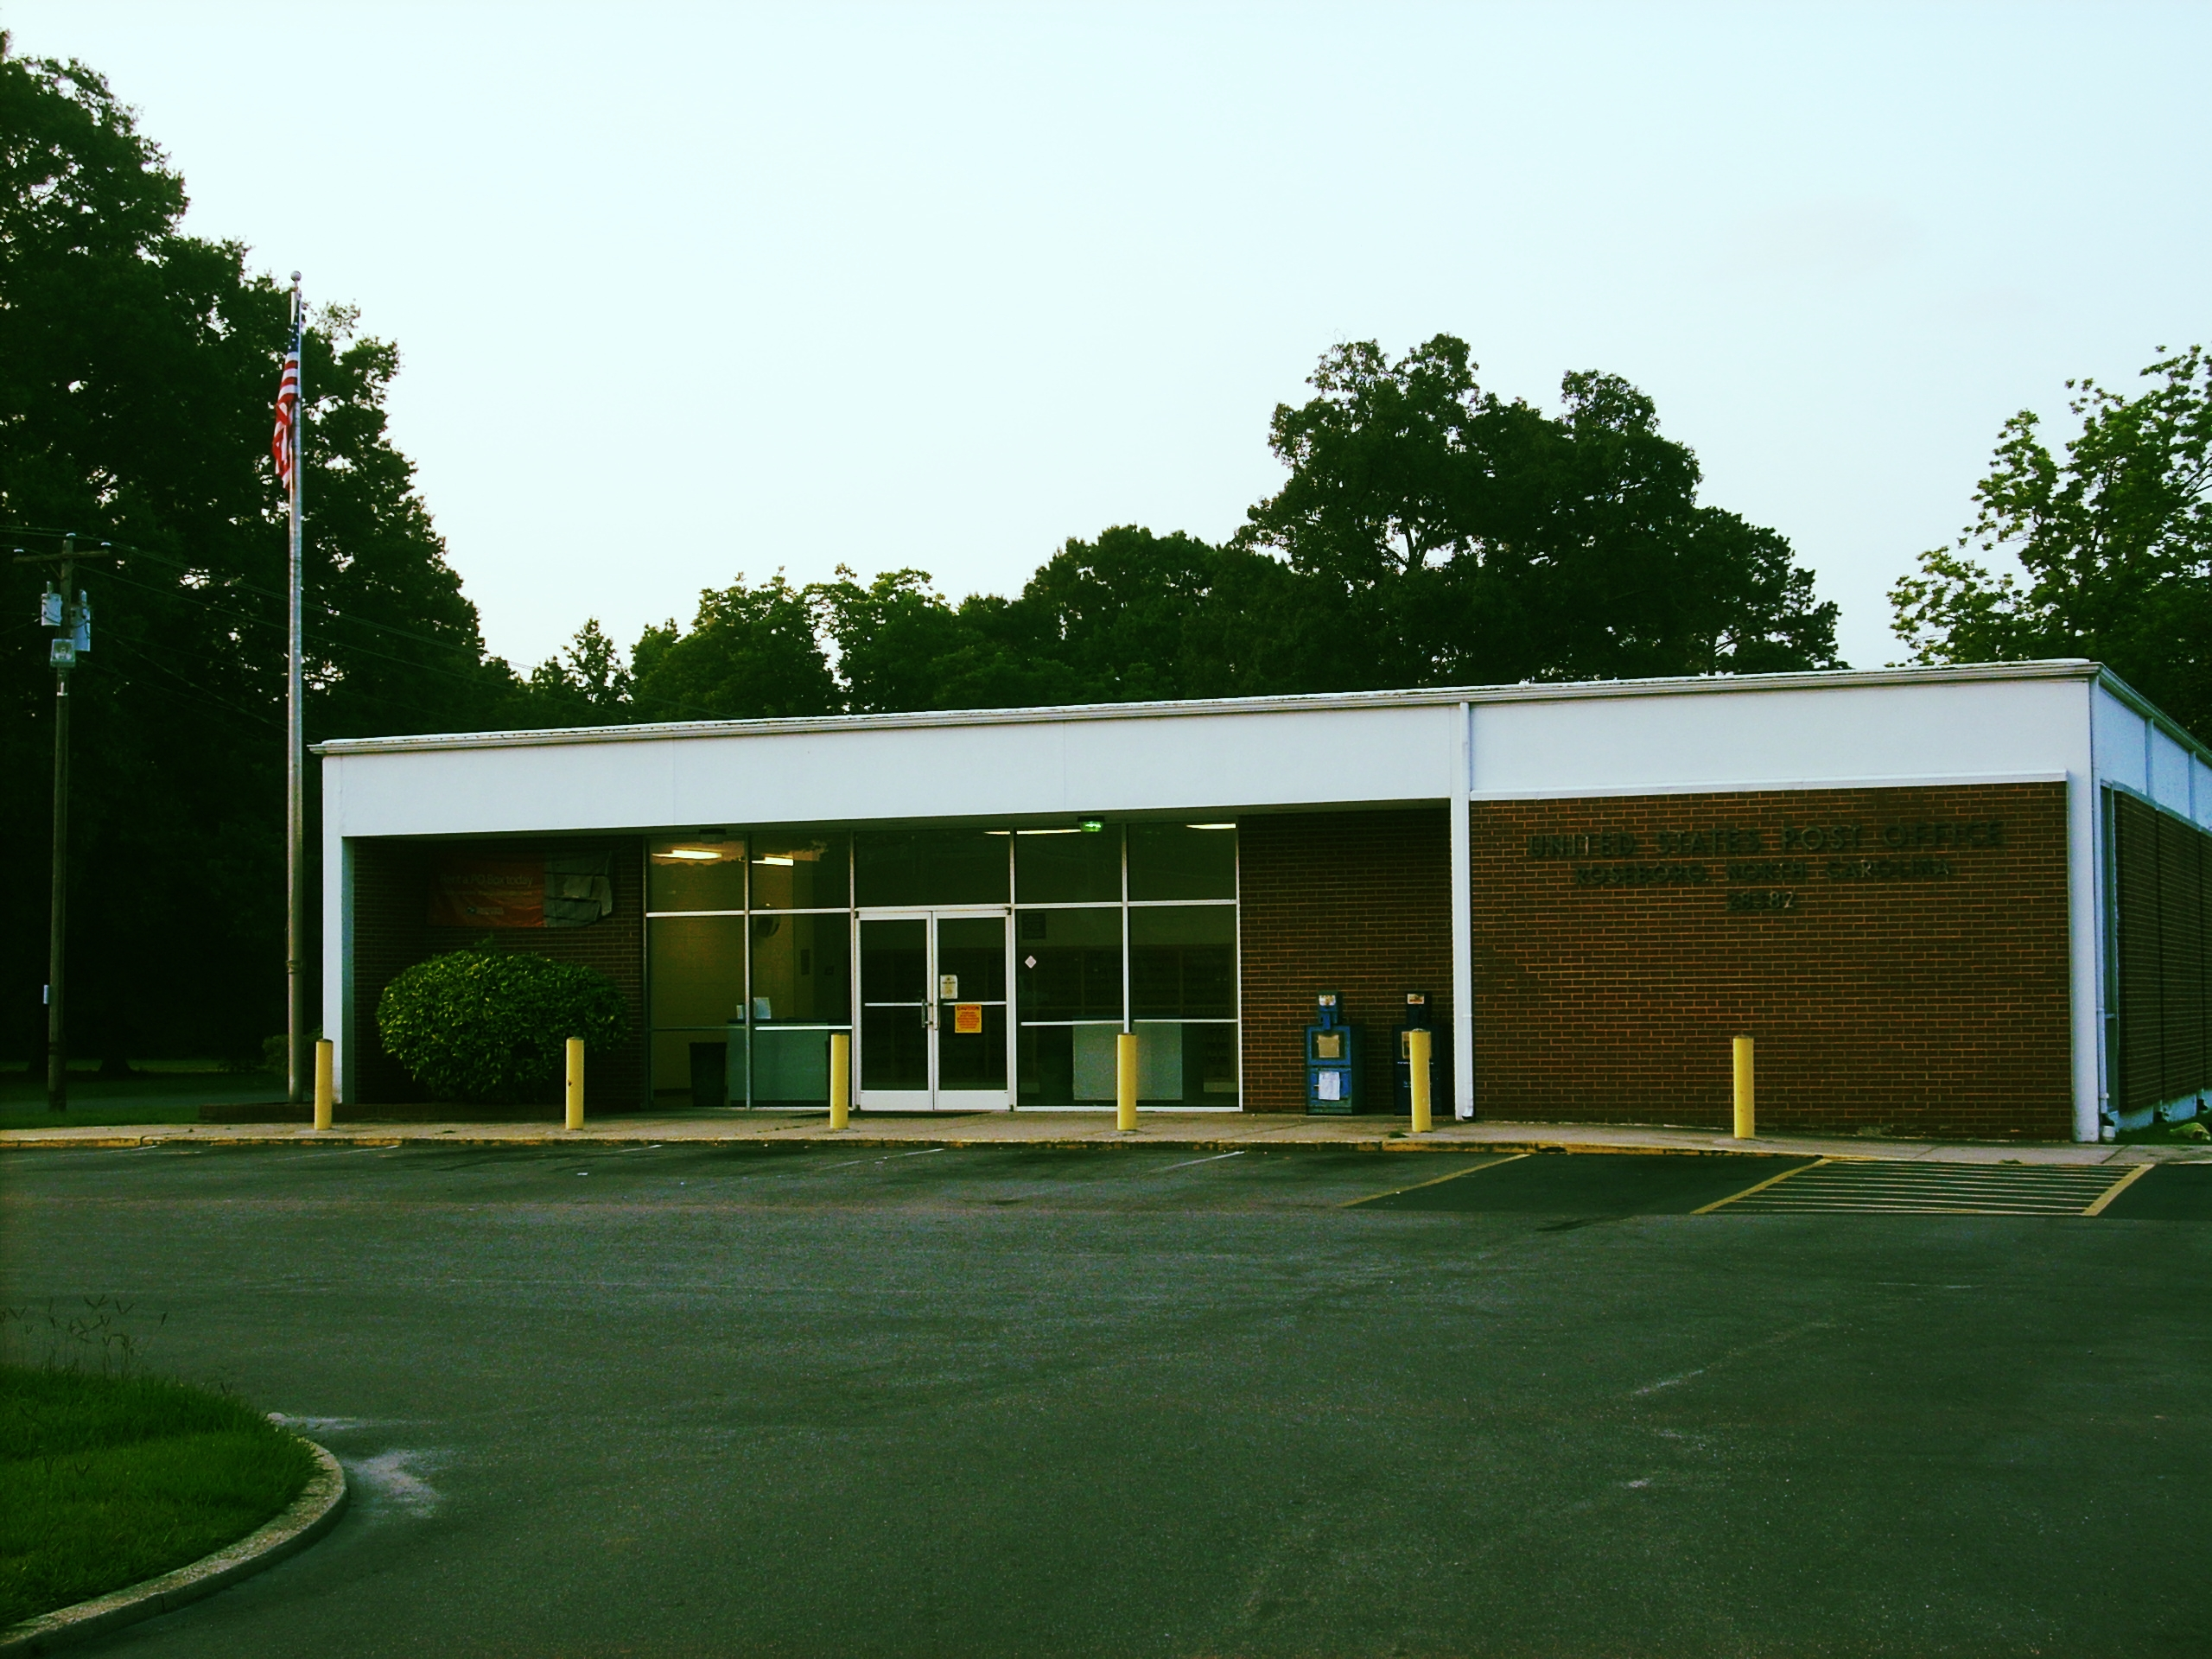 Roseboro Post Office | Flickr - Photo Sharing!roseboro town